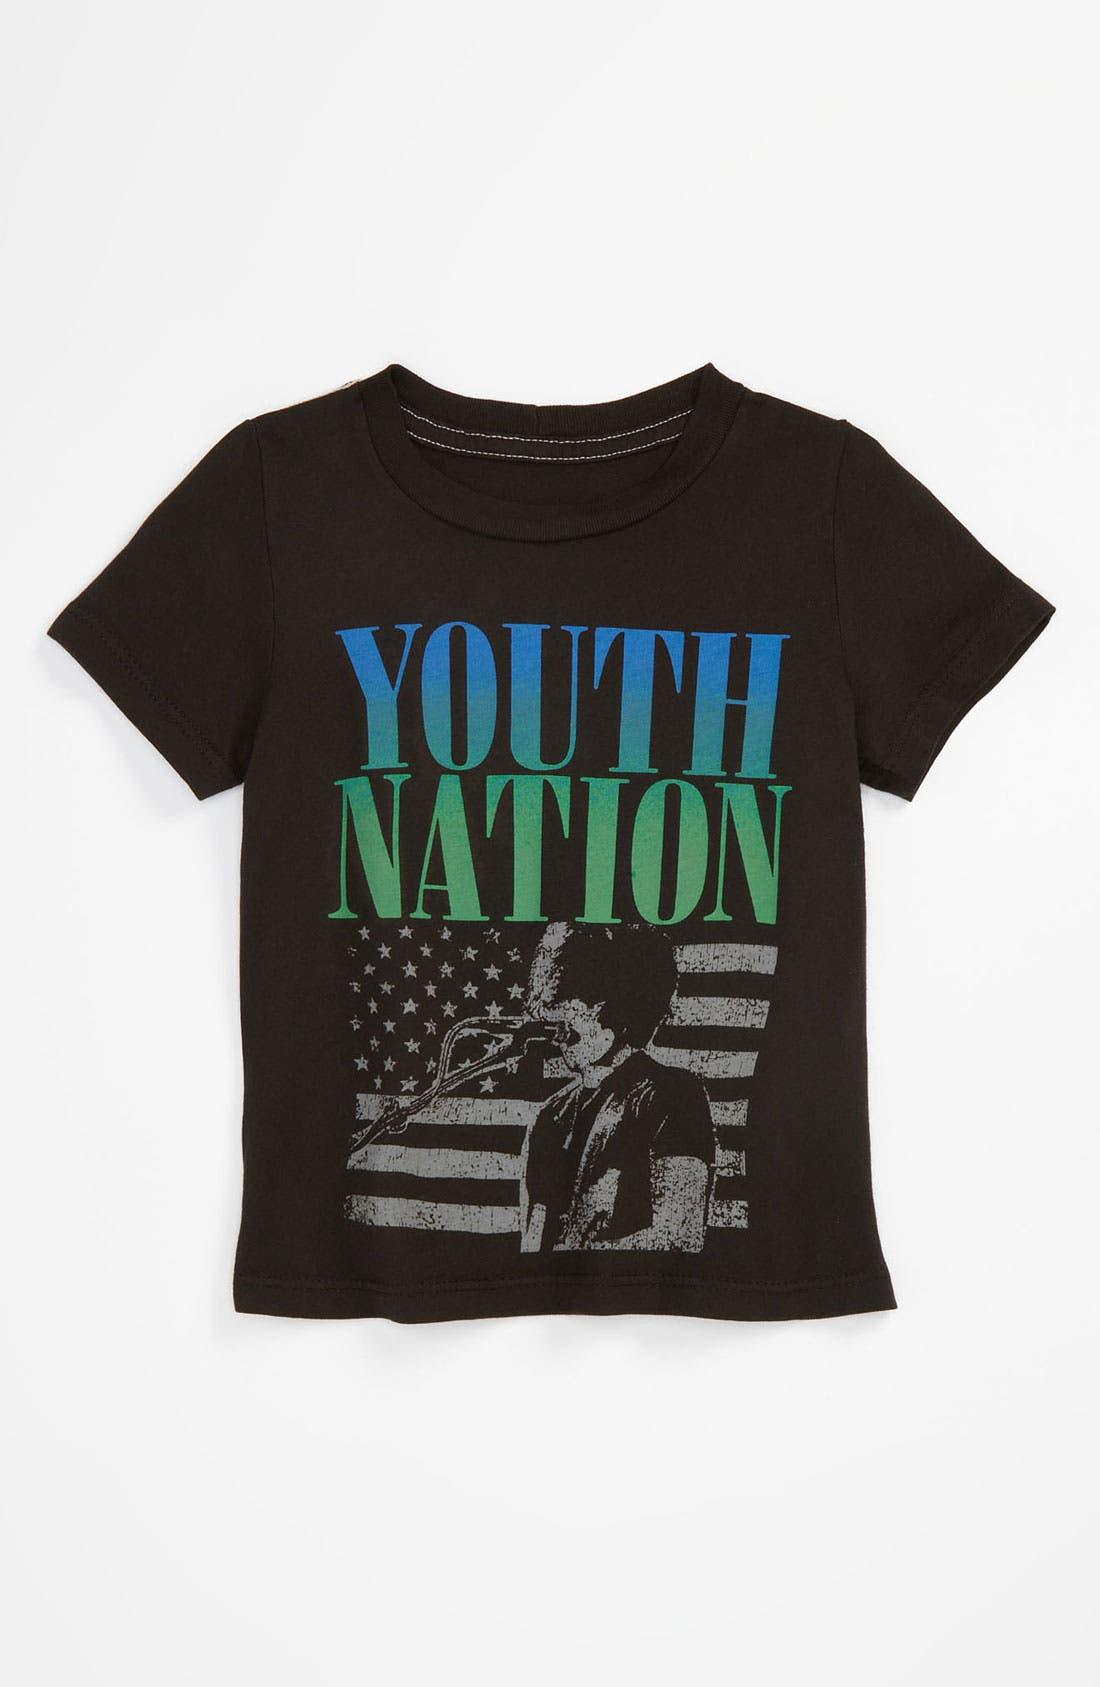 Alternate Image 1 Selected - Peek 'Youth Nation' T-Shirt (Infant)